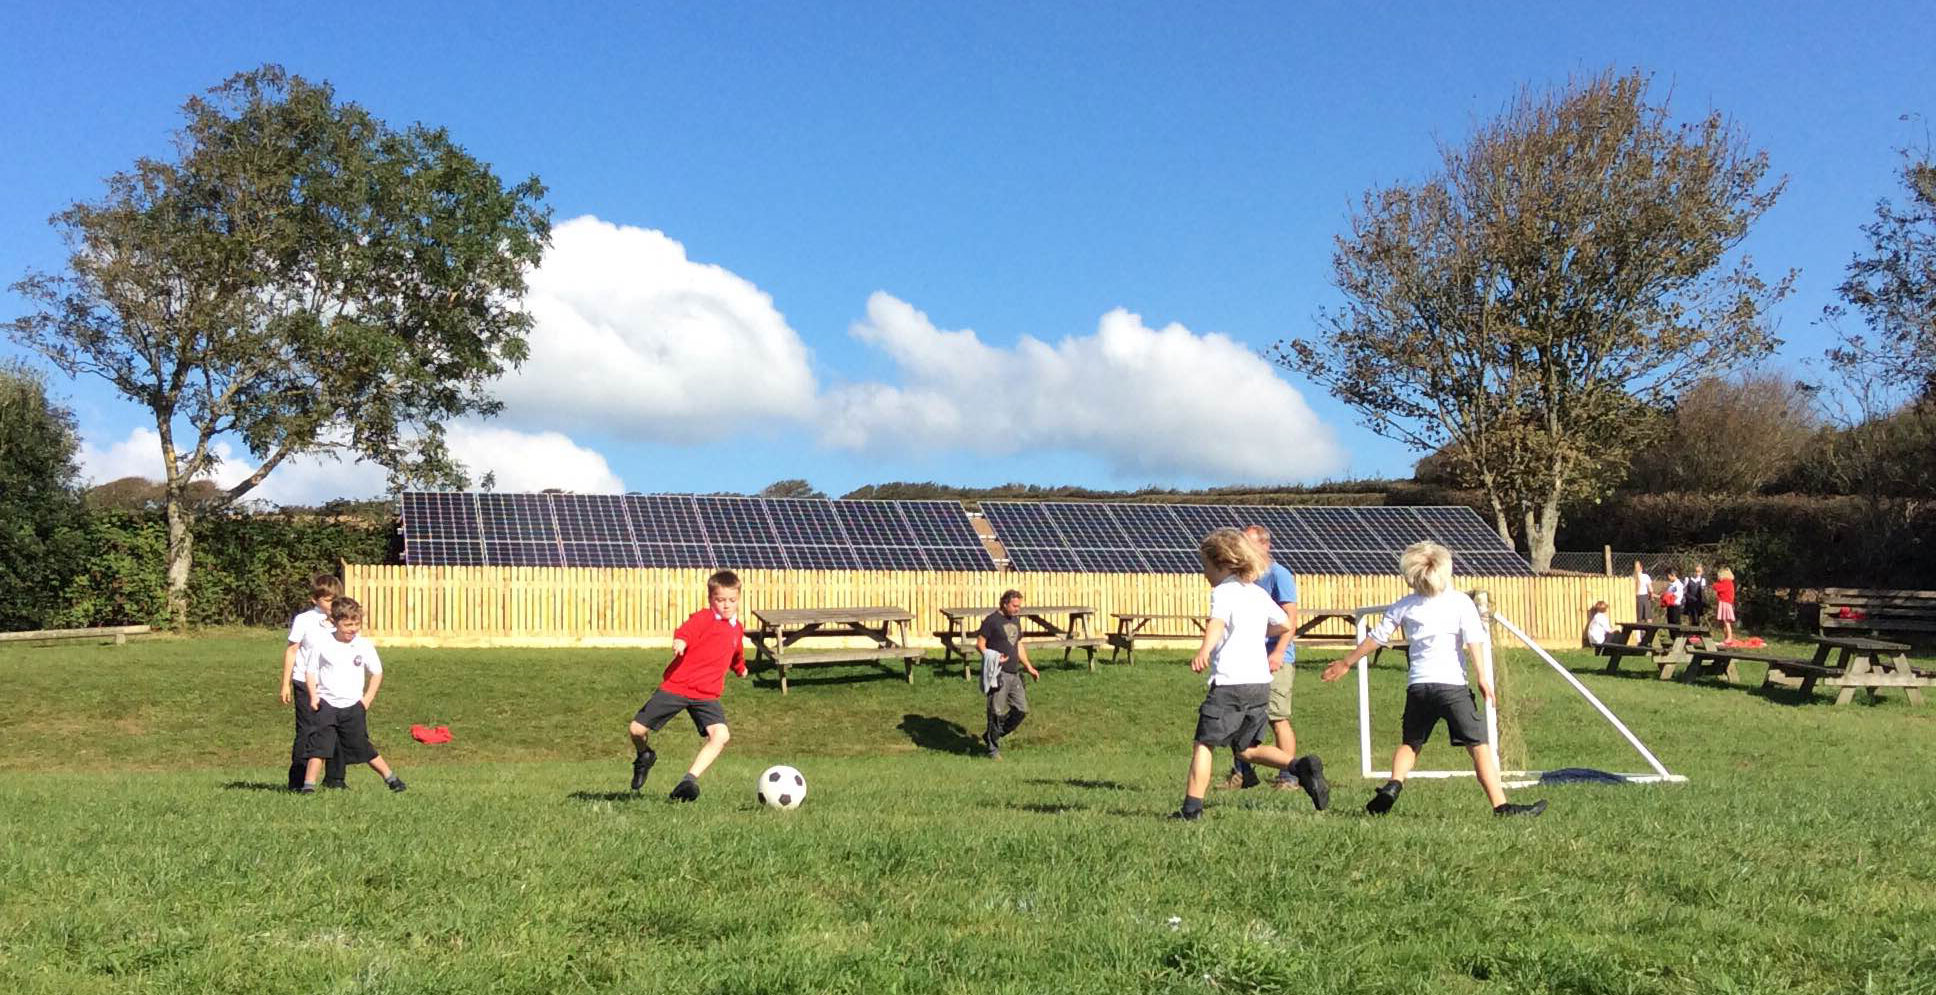 children in school uniform play football in front of solar panels